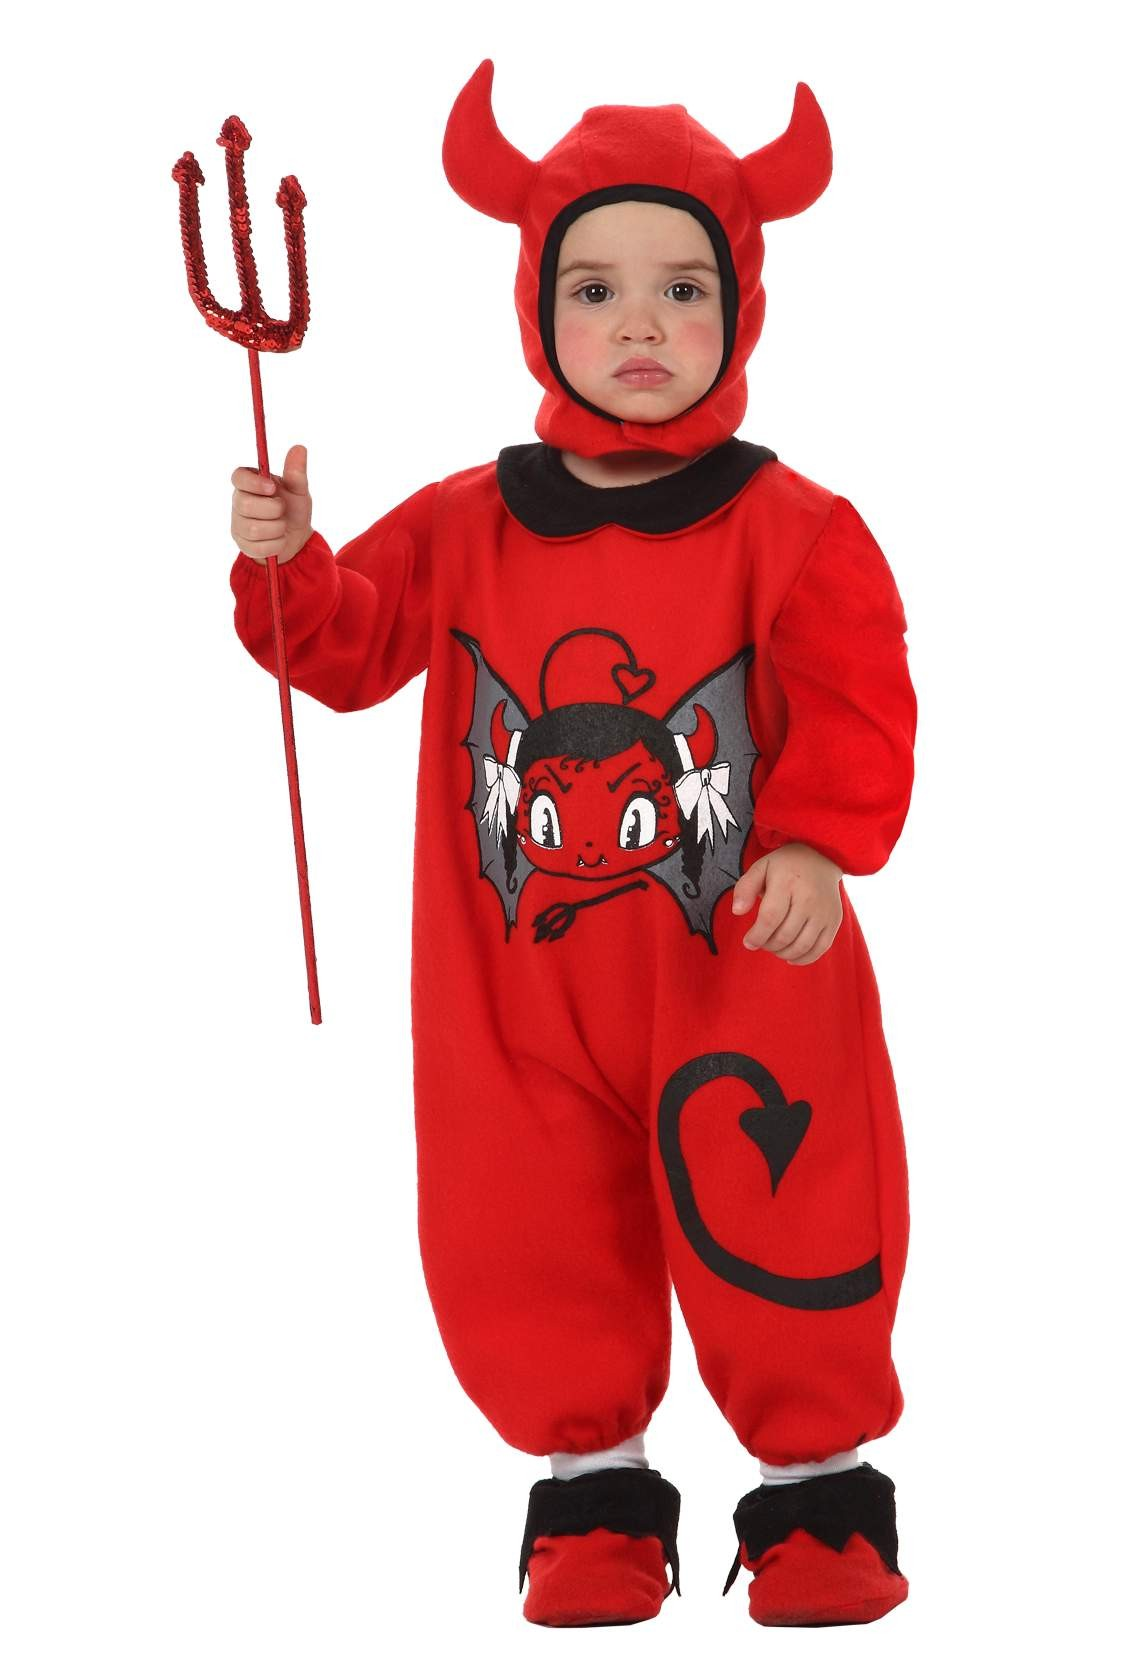 d guisement diable b b costume halloween 0 24 mois pas cher. Black Bedroom Furniture Sets. Home Design Ideas